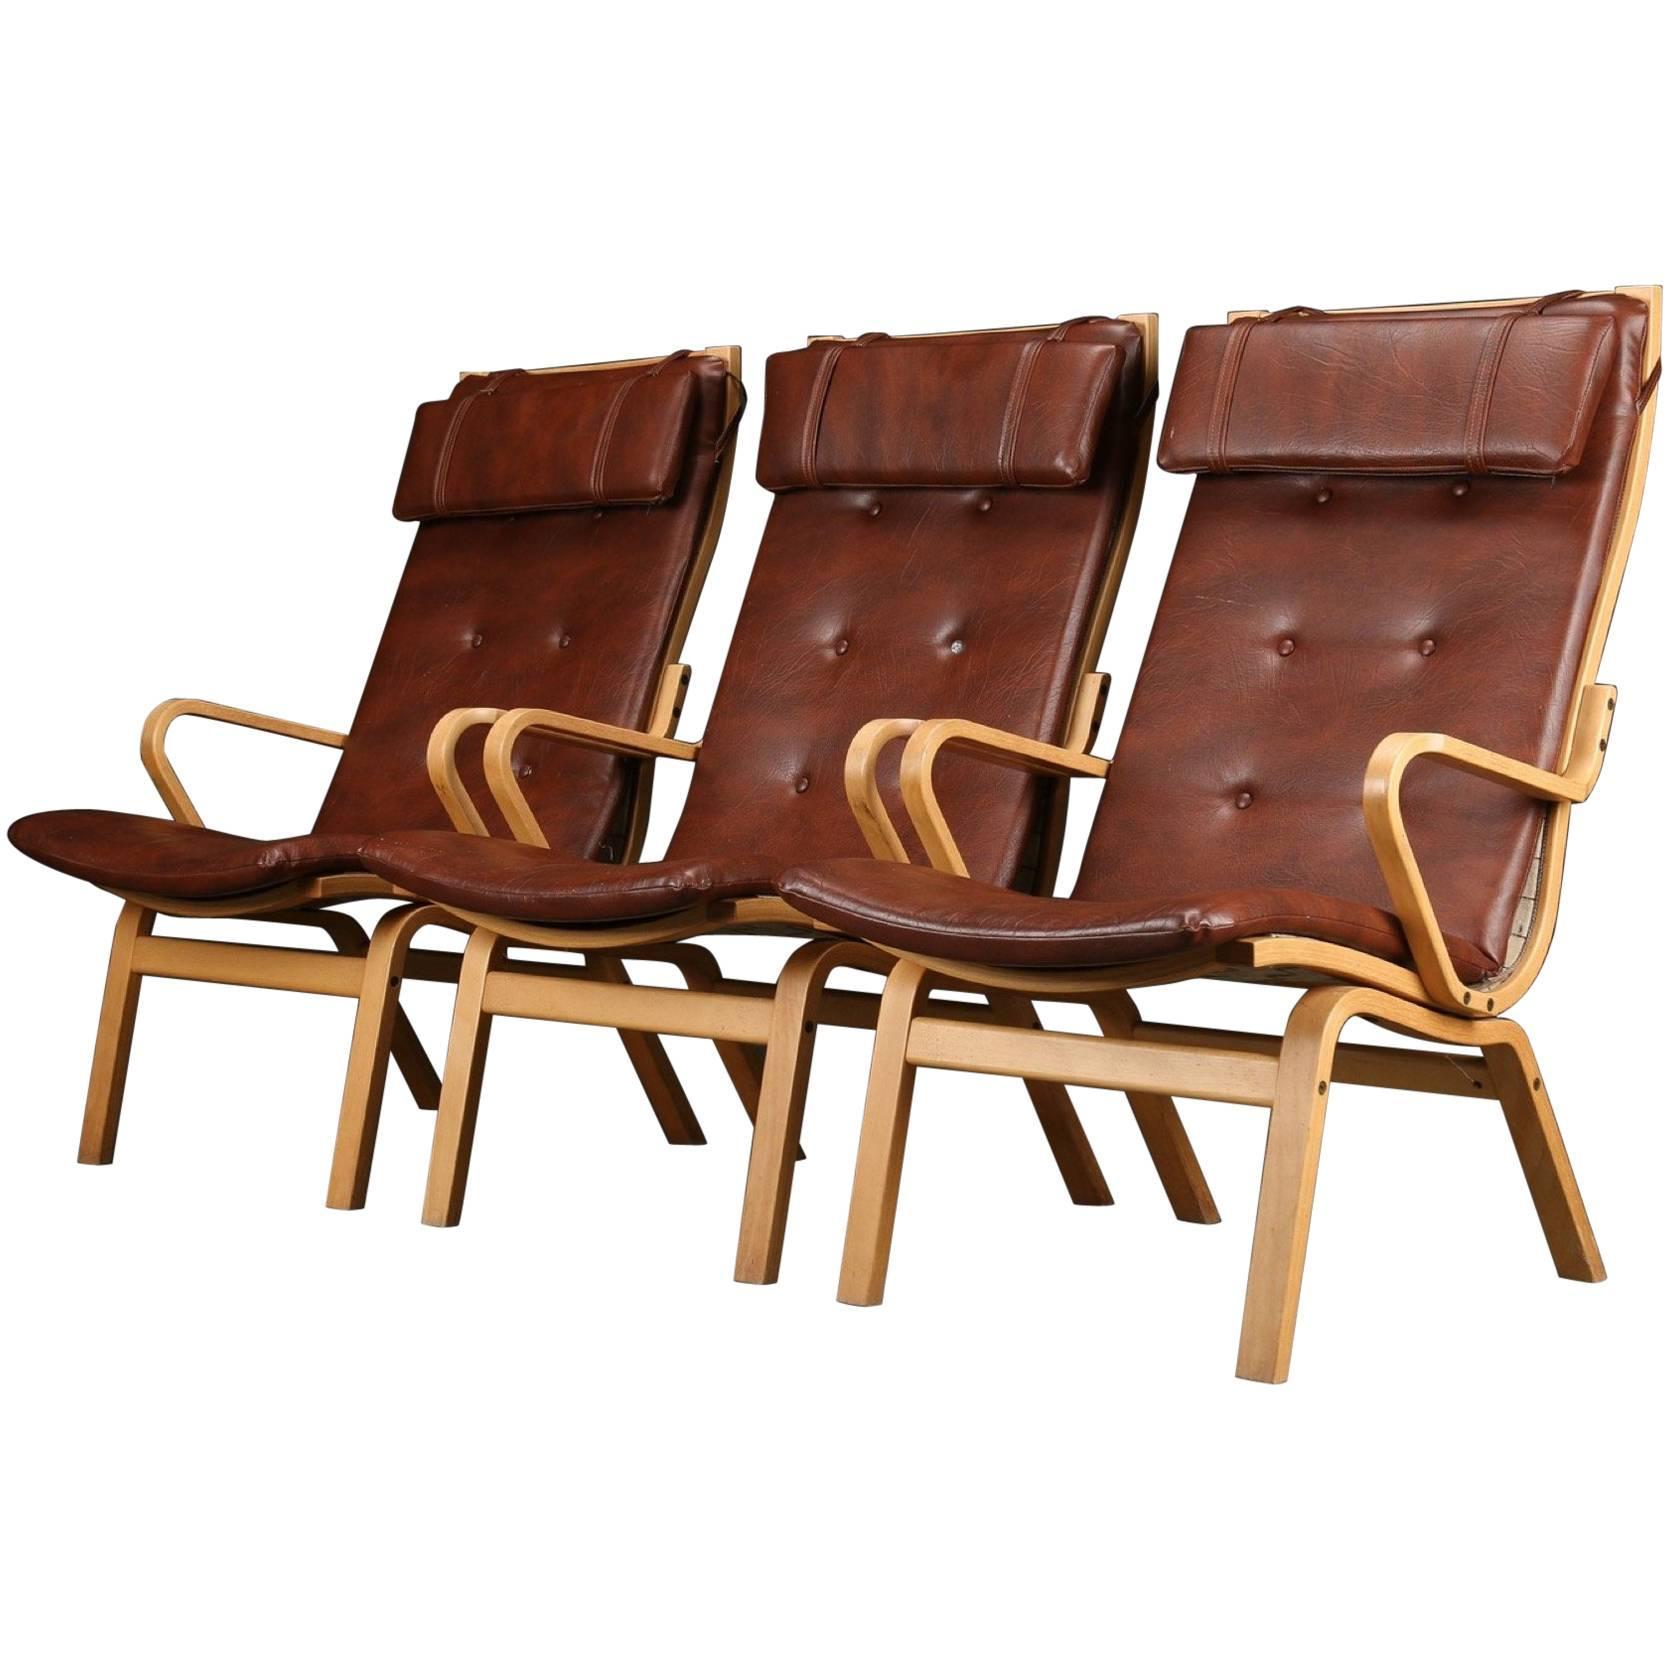 Set of Three Finn Østergaard Midcentury Swedish Armchairs w/ Round Coffee Table